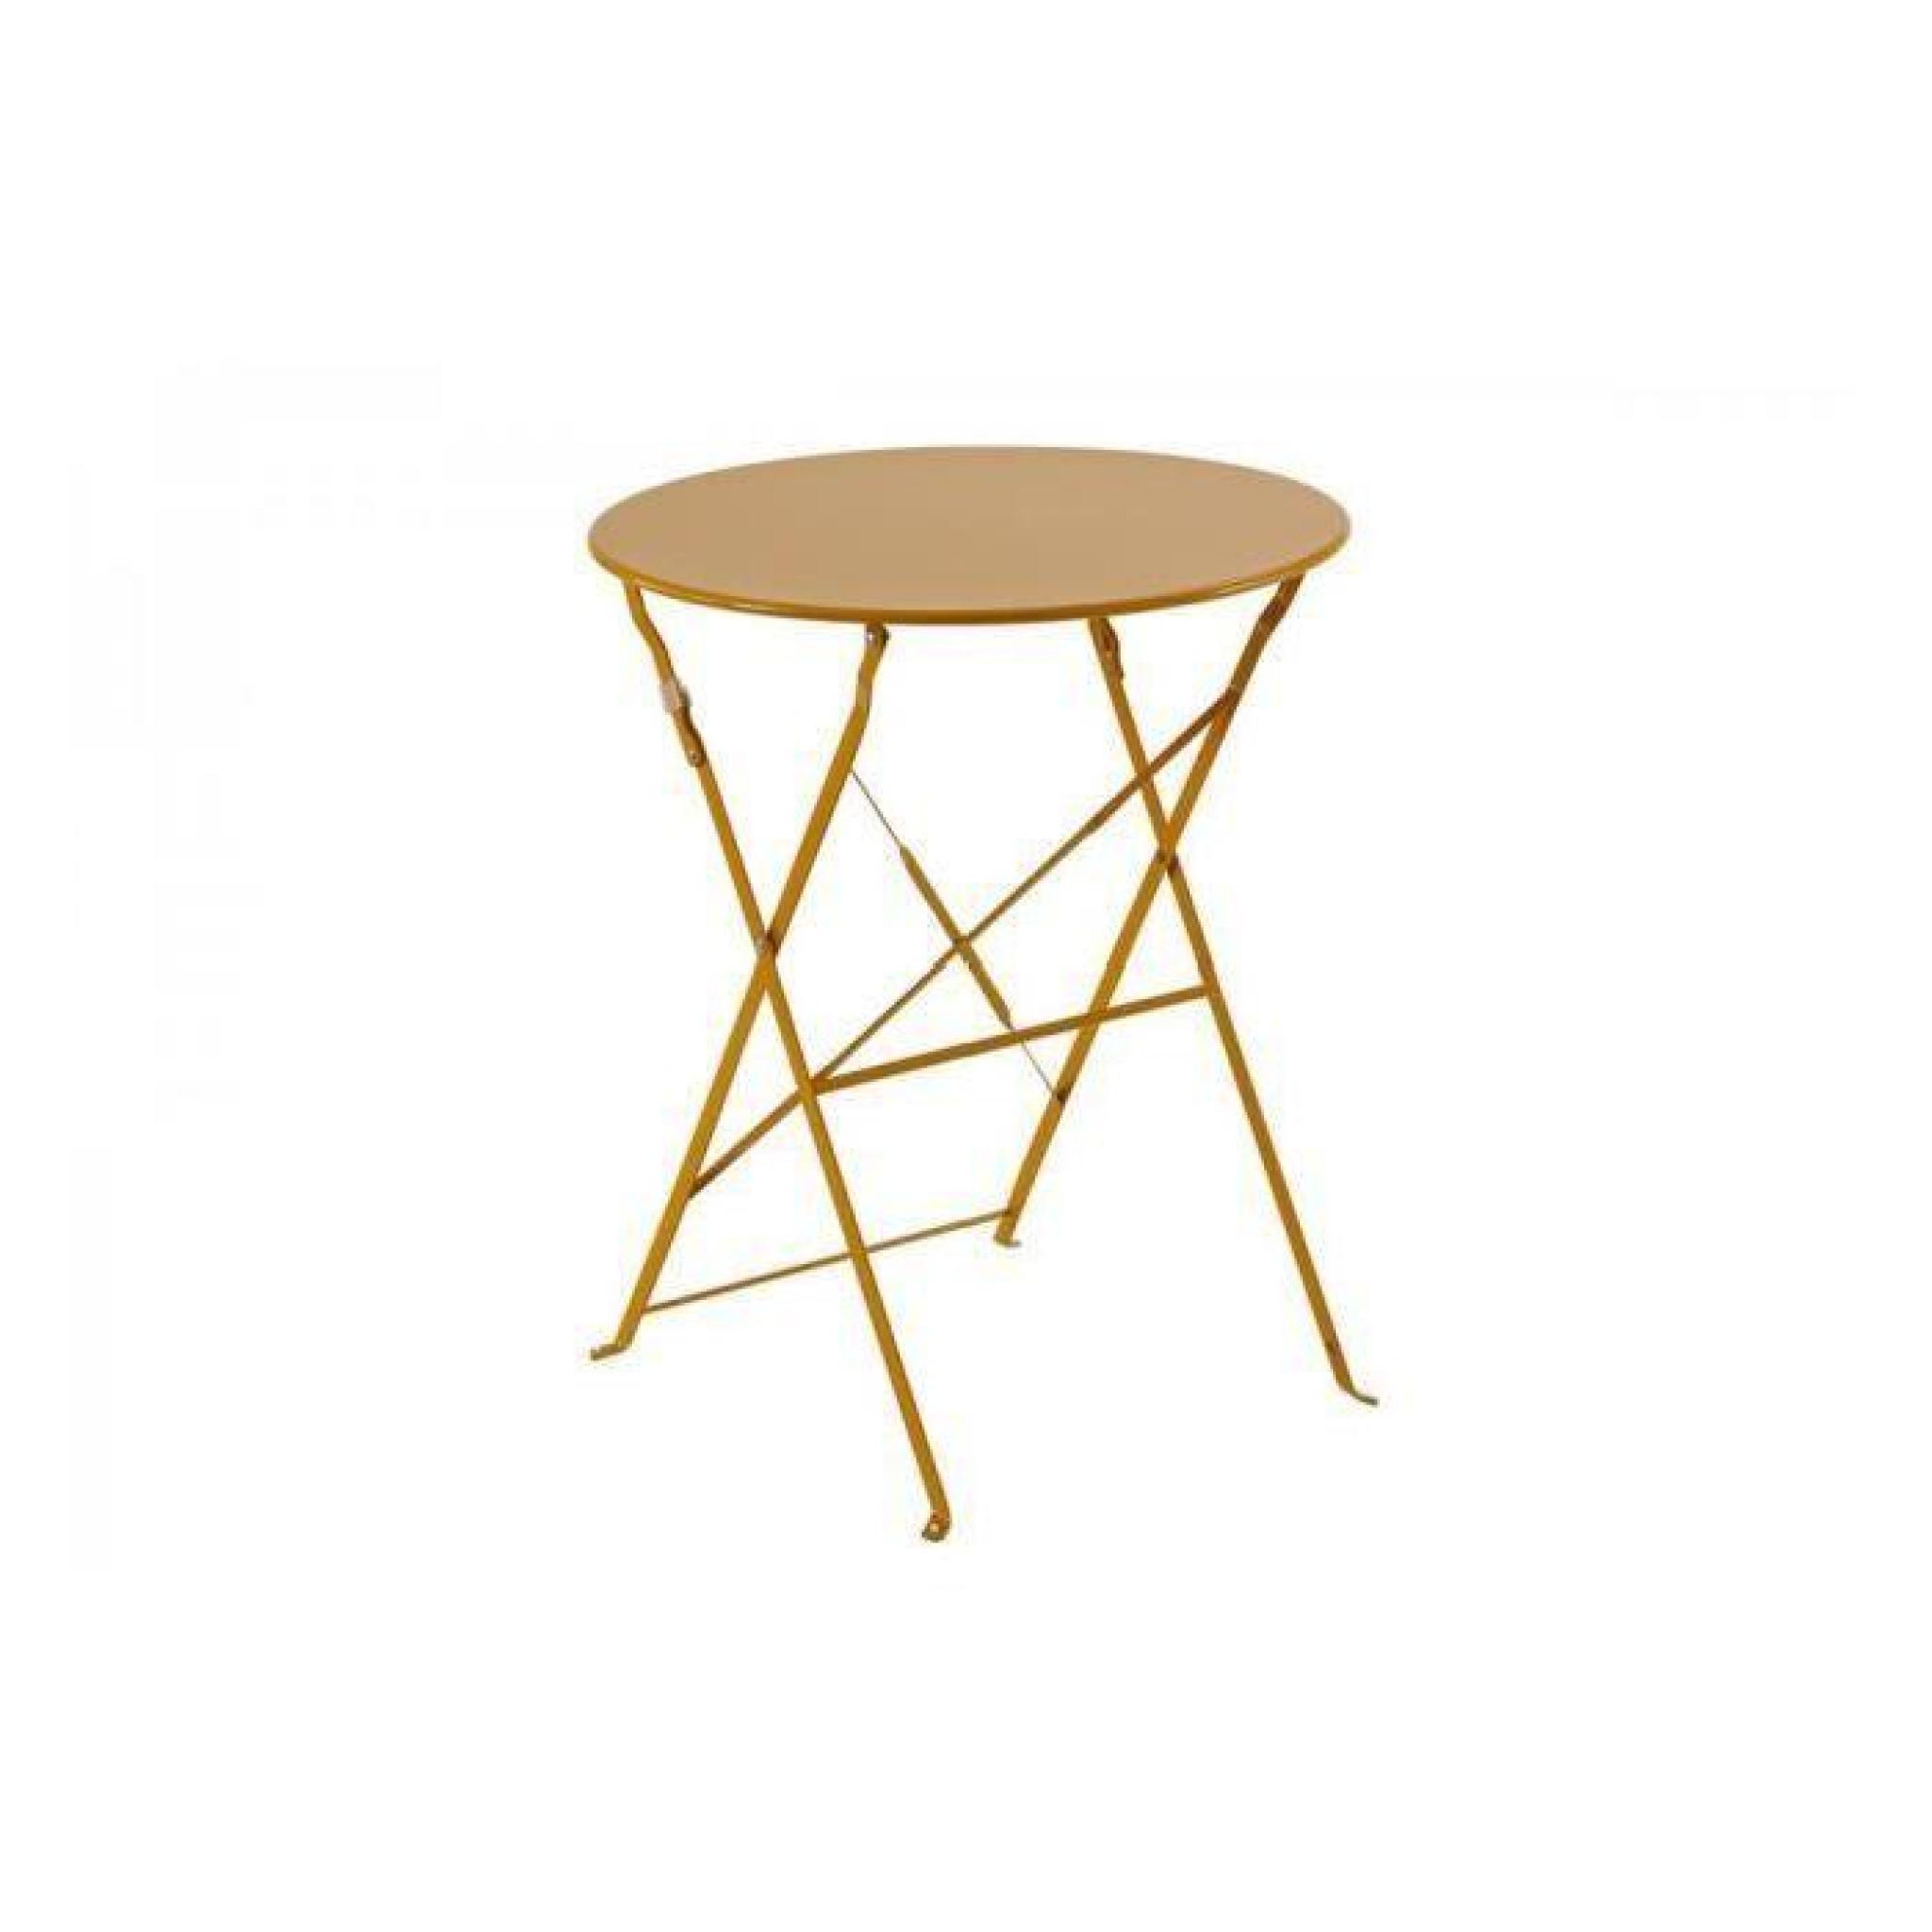 TABLE RONDE 60CM PLIANTE CAMARGUE HESPERIDE ORANGE